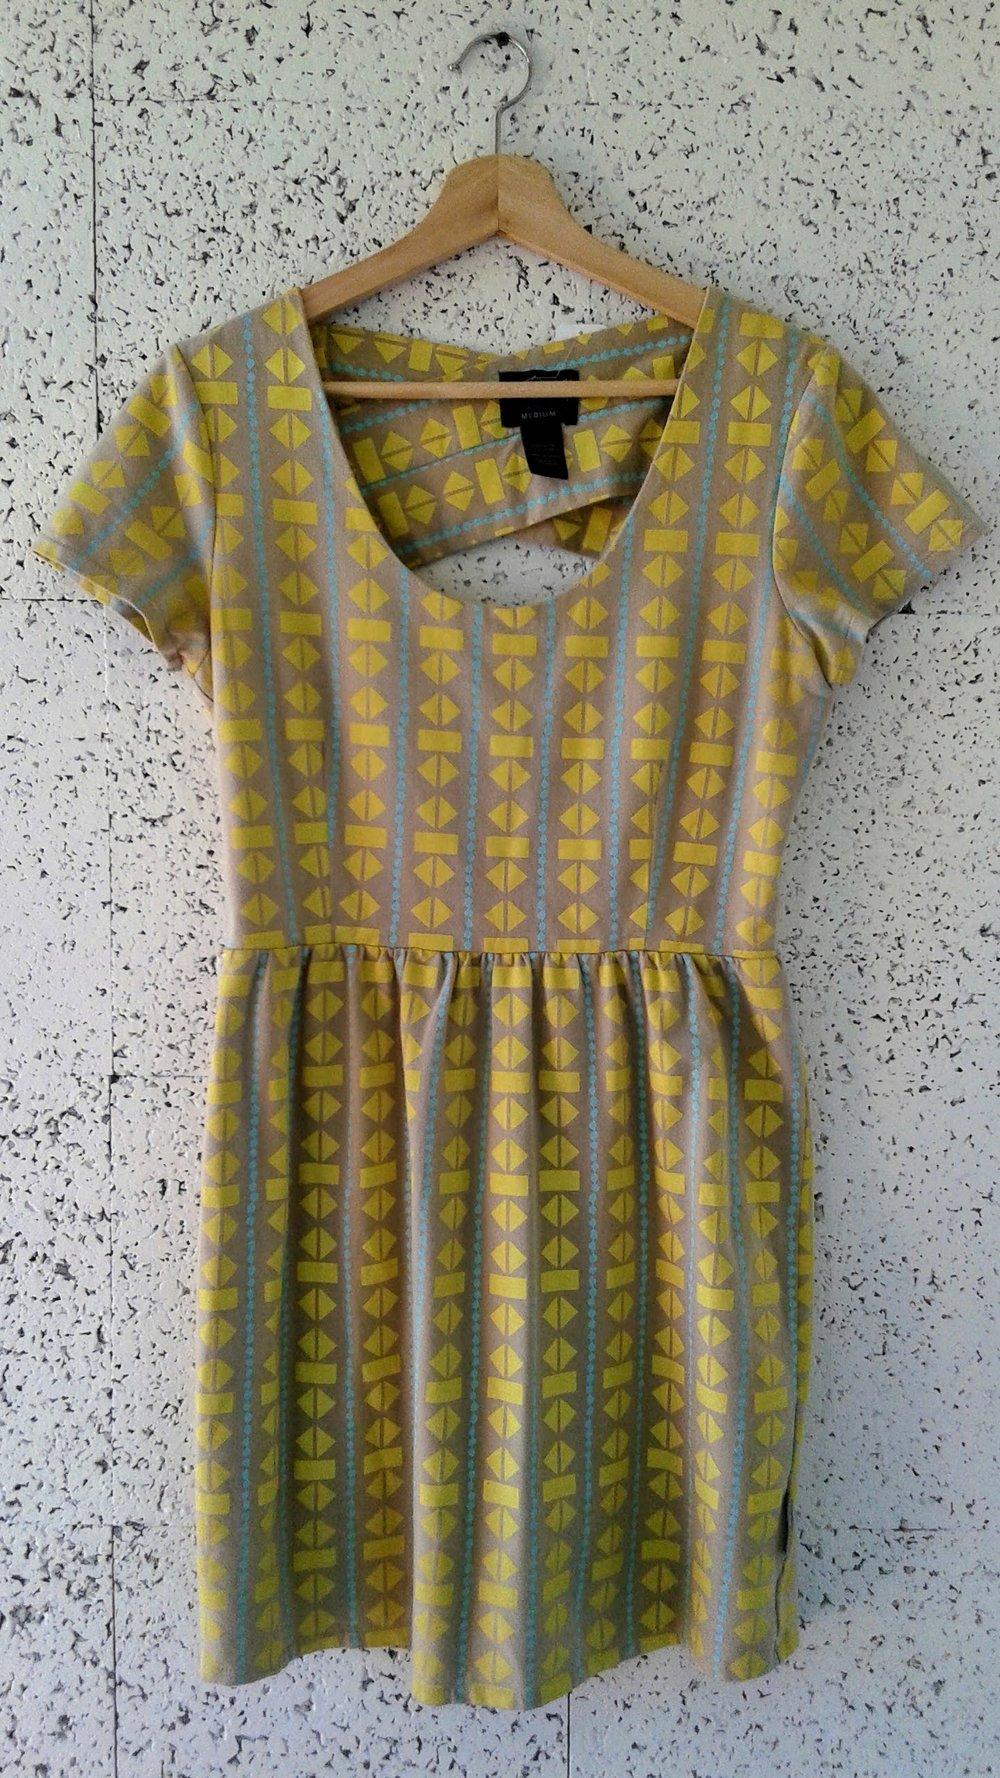 StUssy dres; Size M, $38